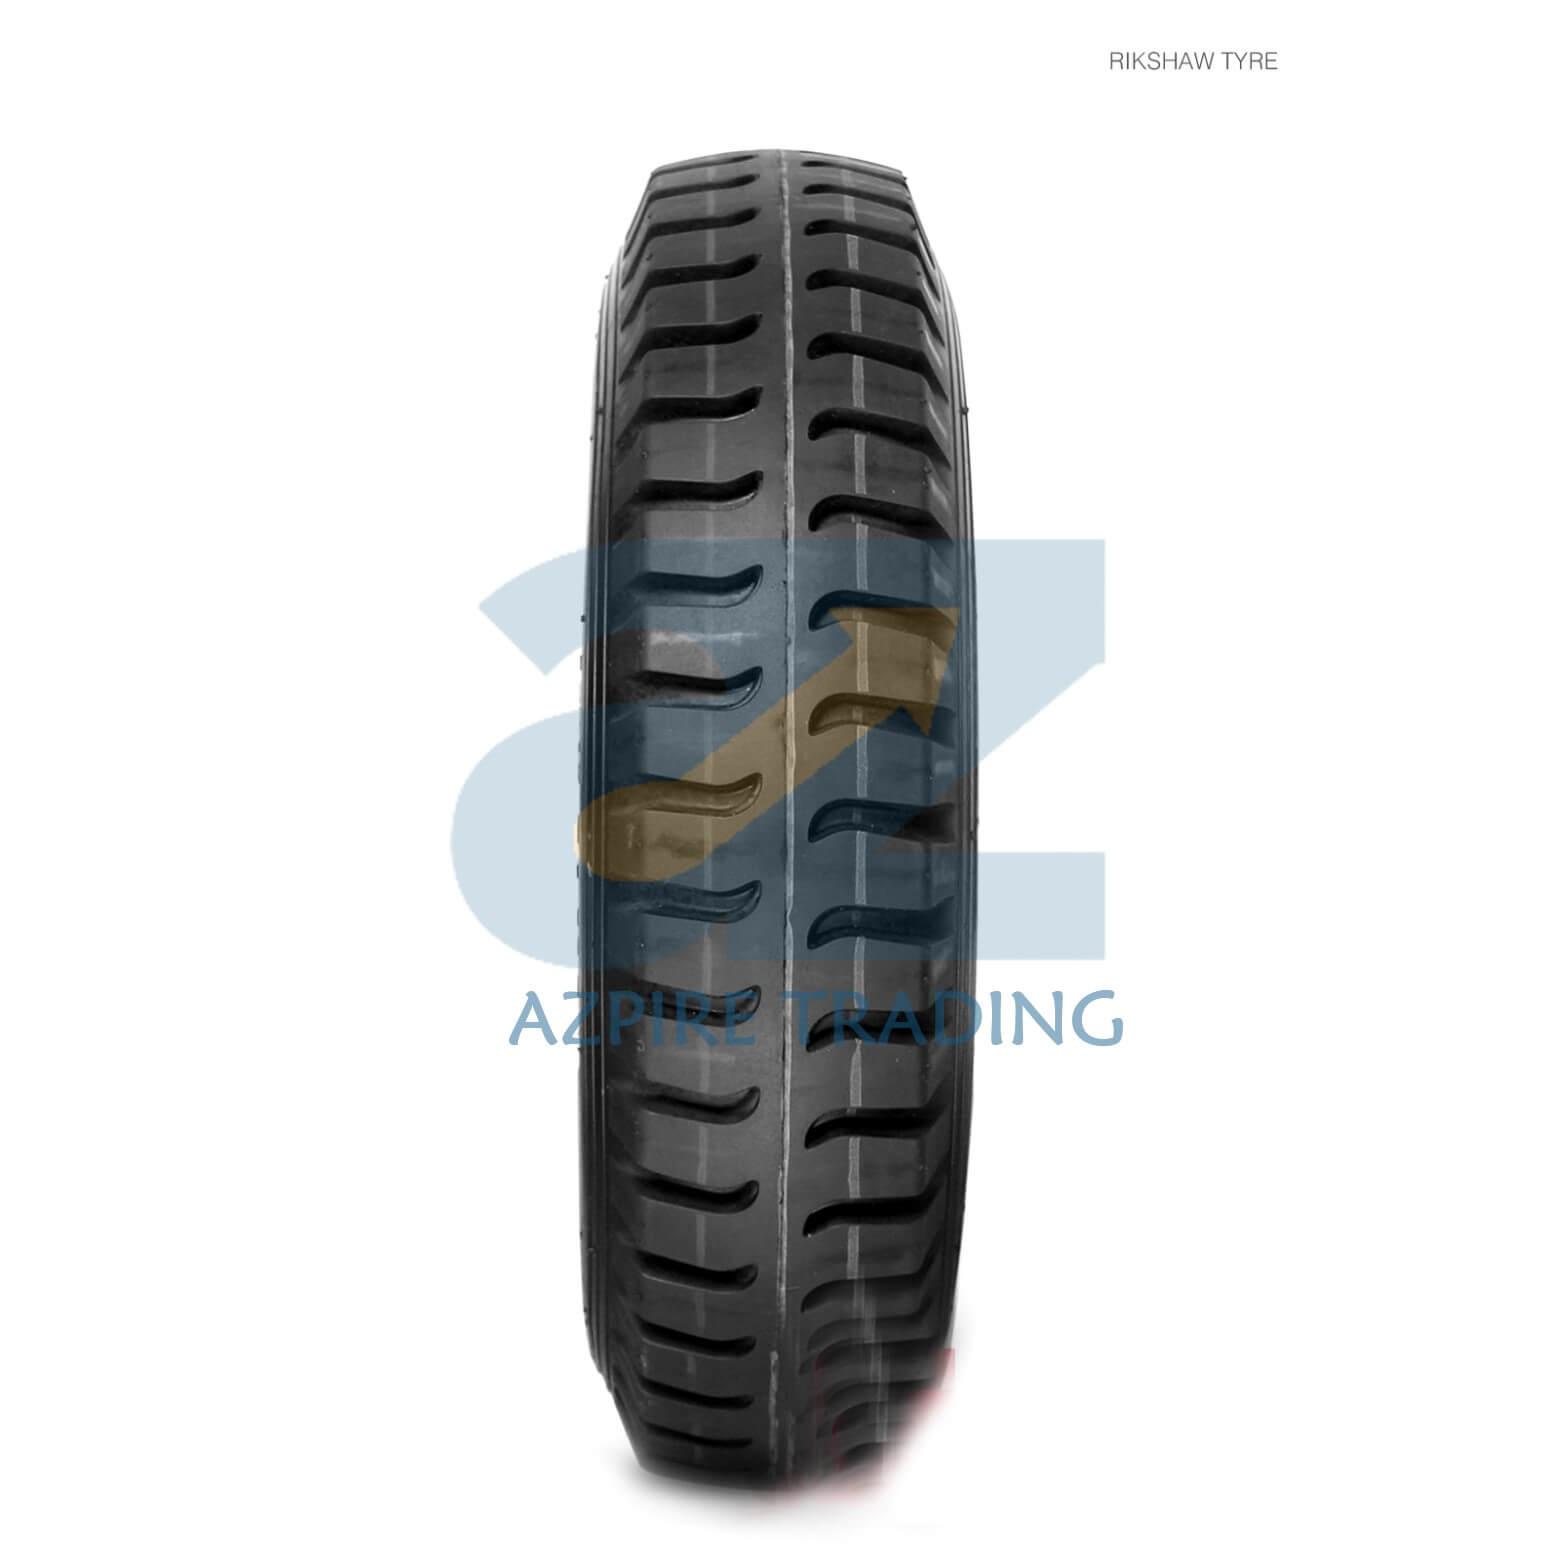 Rickshaw Tyre - AZ-RK-005